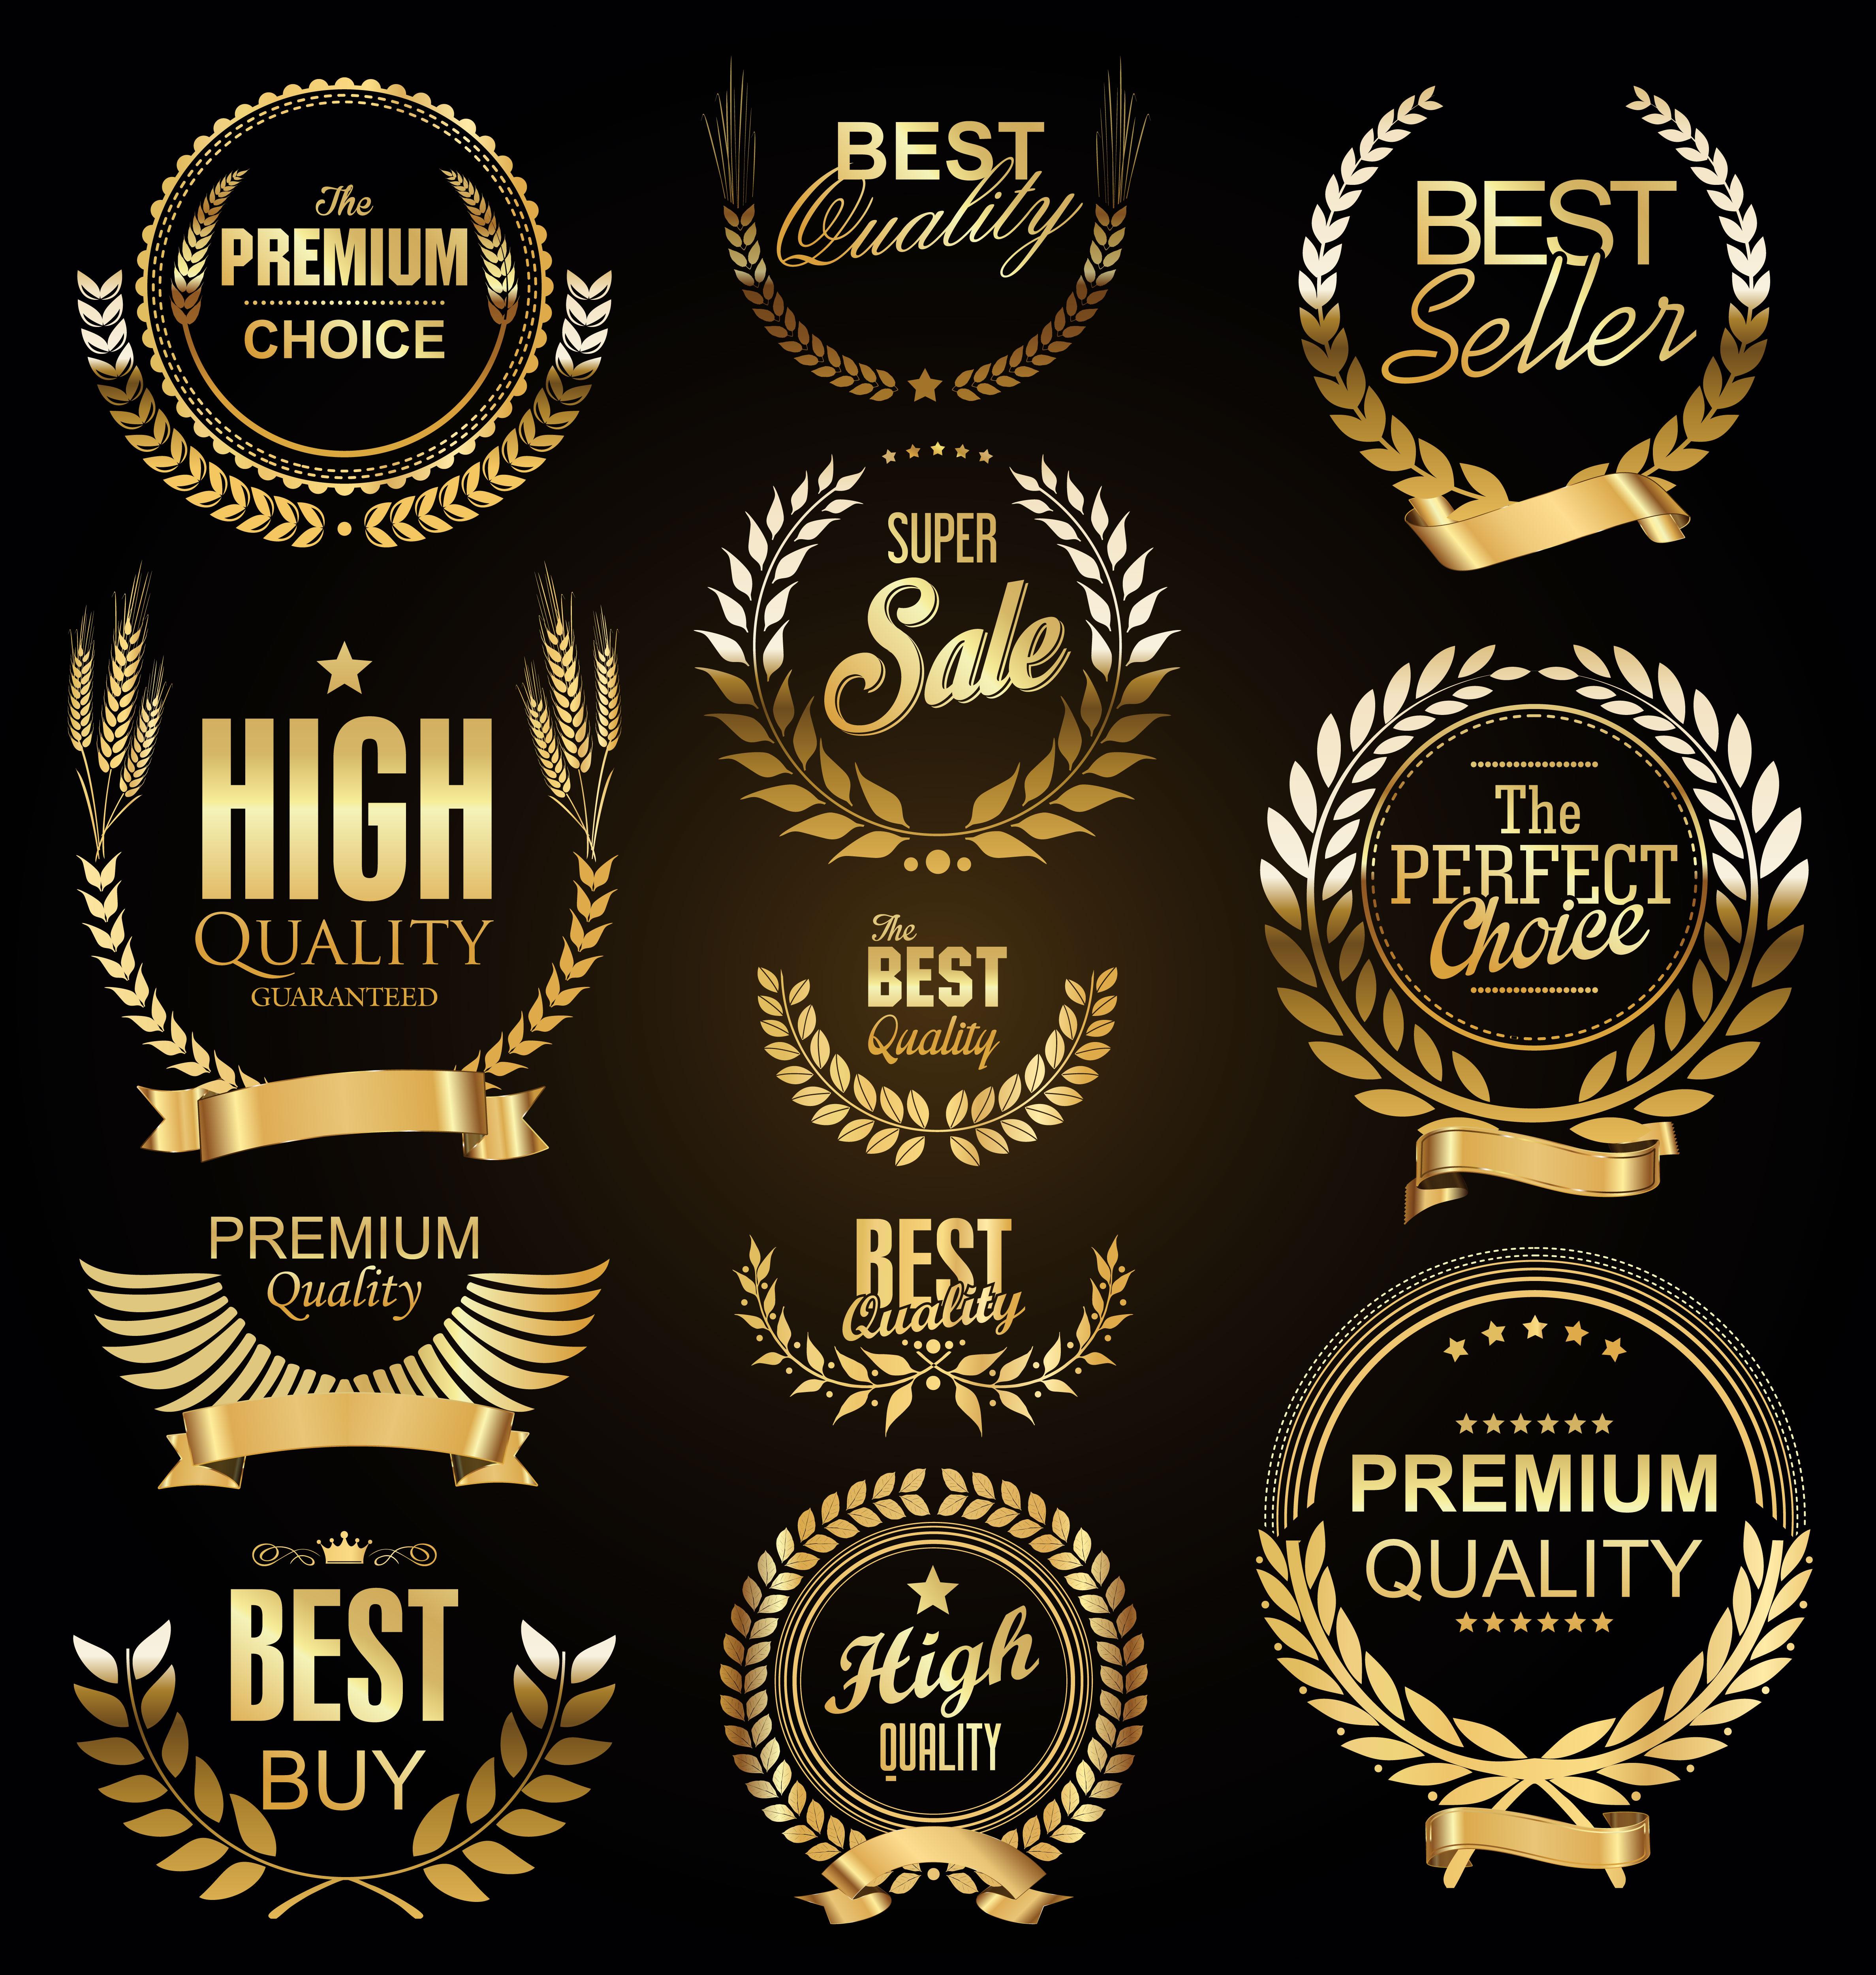 Premium Collection Badge Design: Retro Vintage Golden Laurel Wreaths Sale Collection Vector